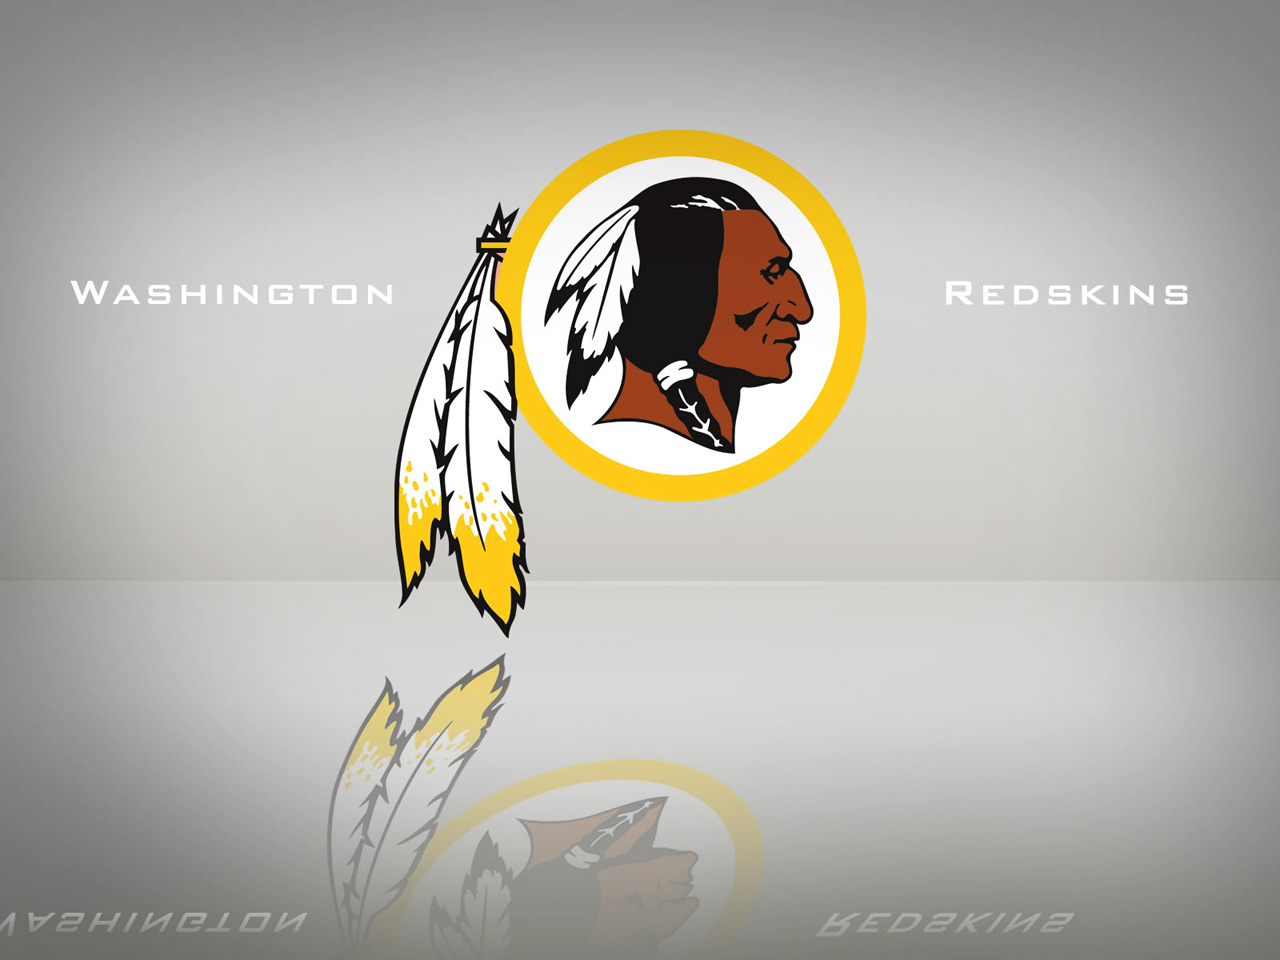 Washington Redskins wallpapers Washington Redskins background 1280x960